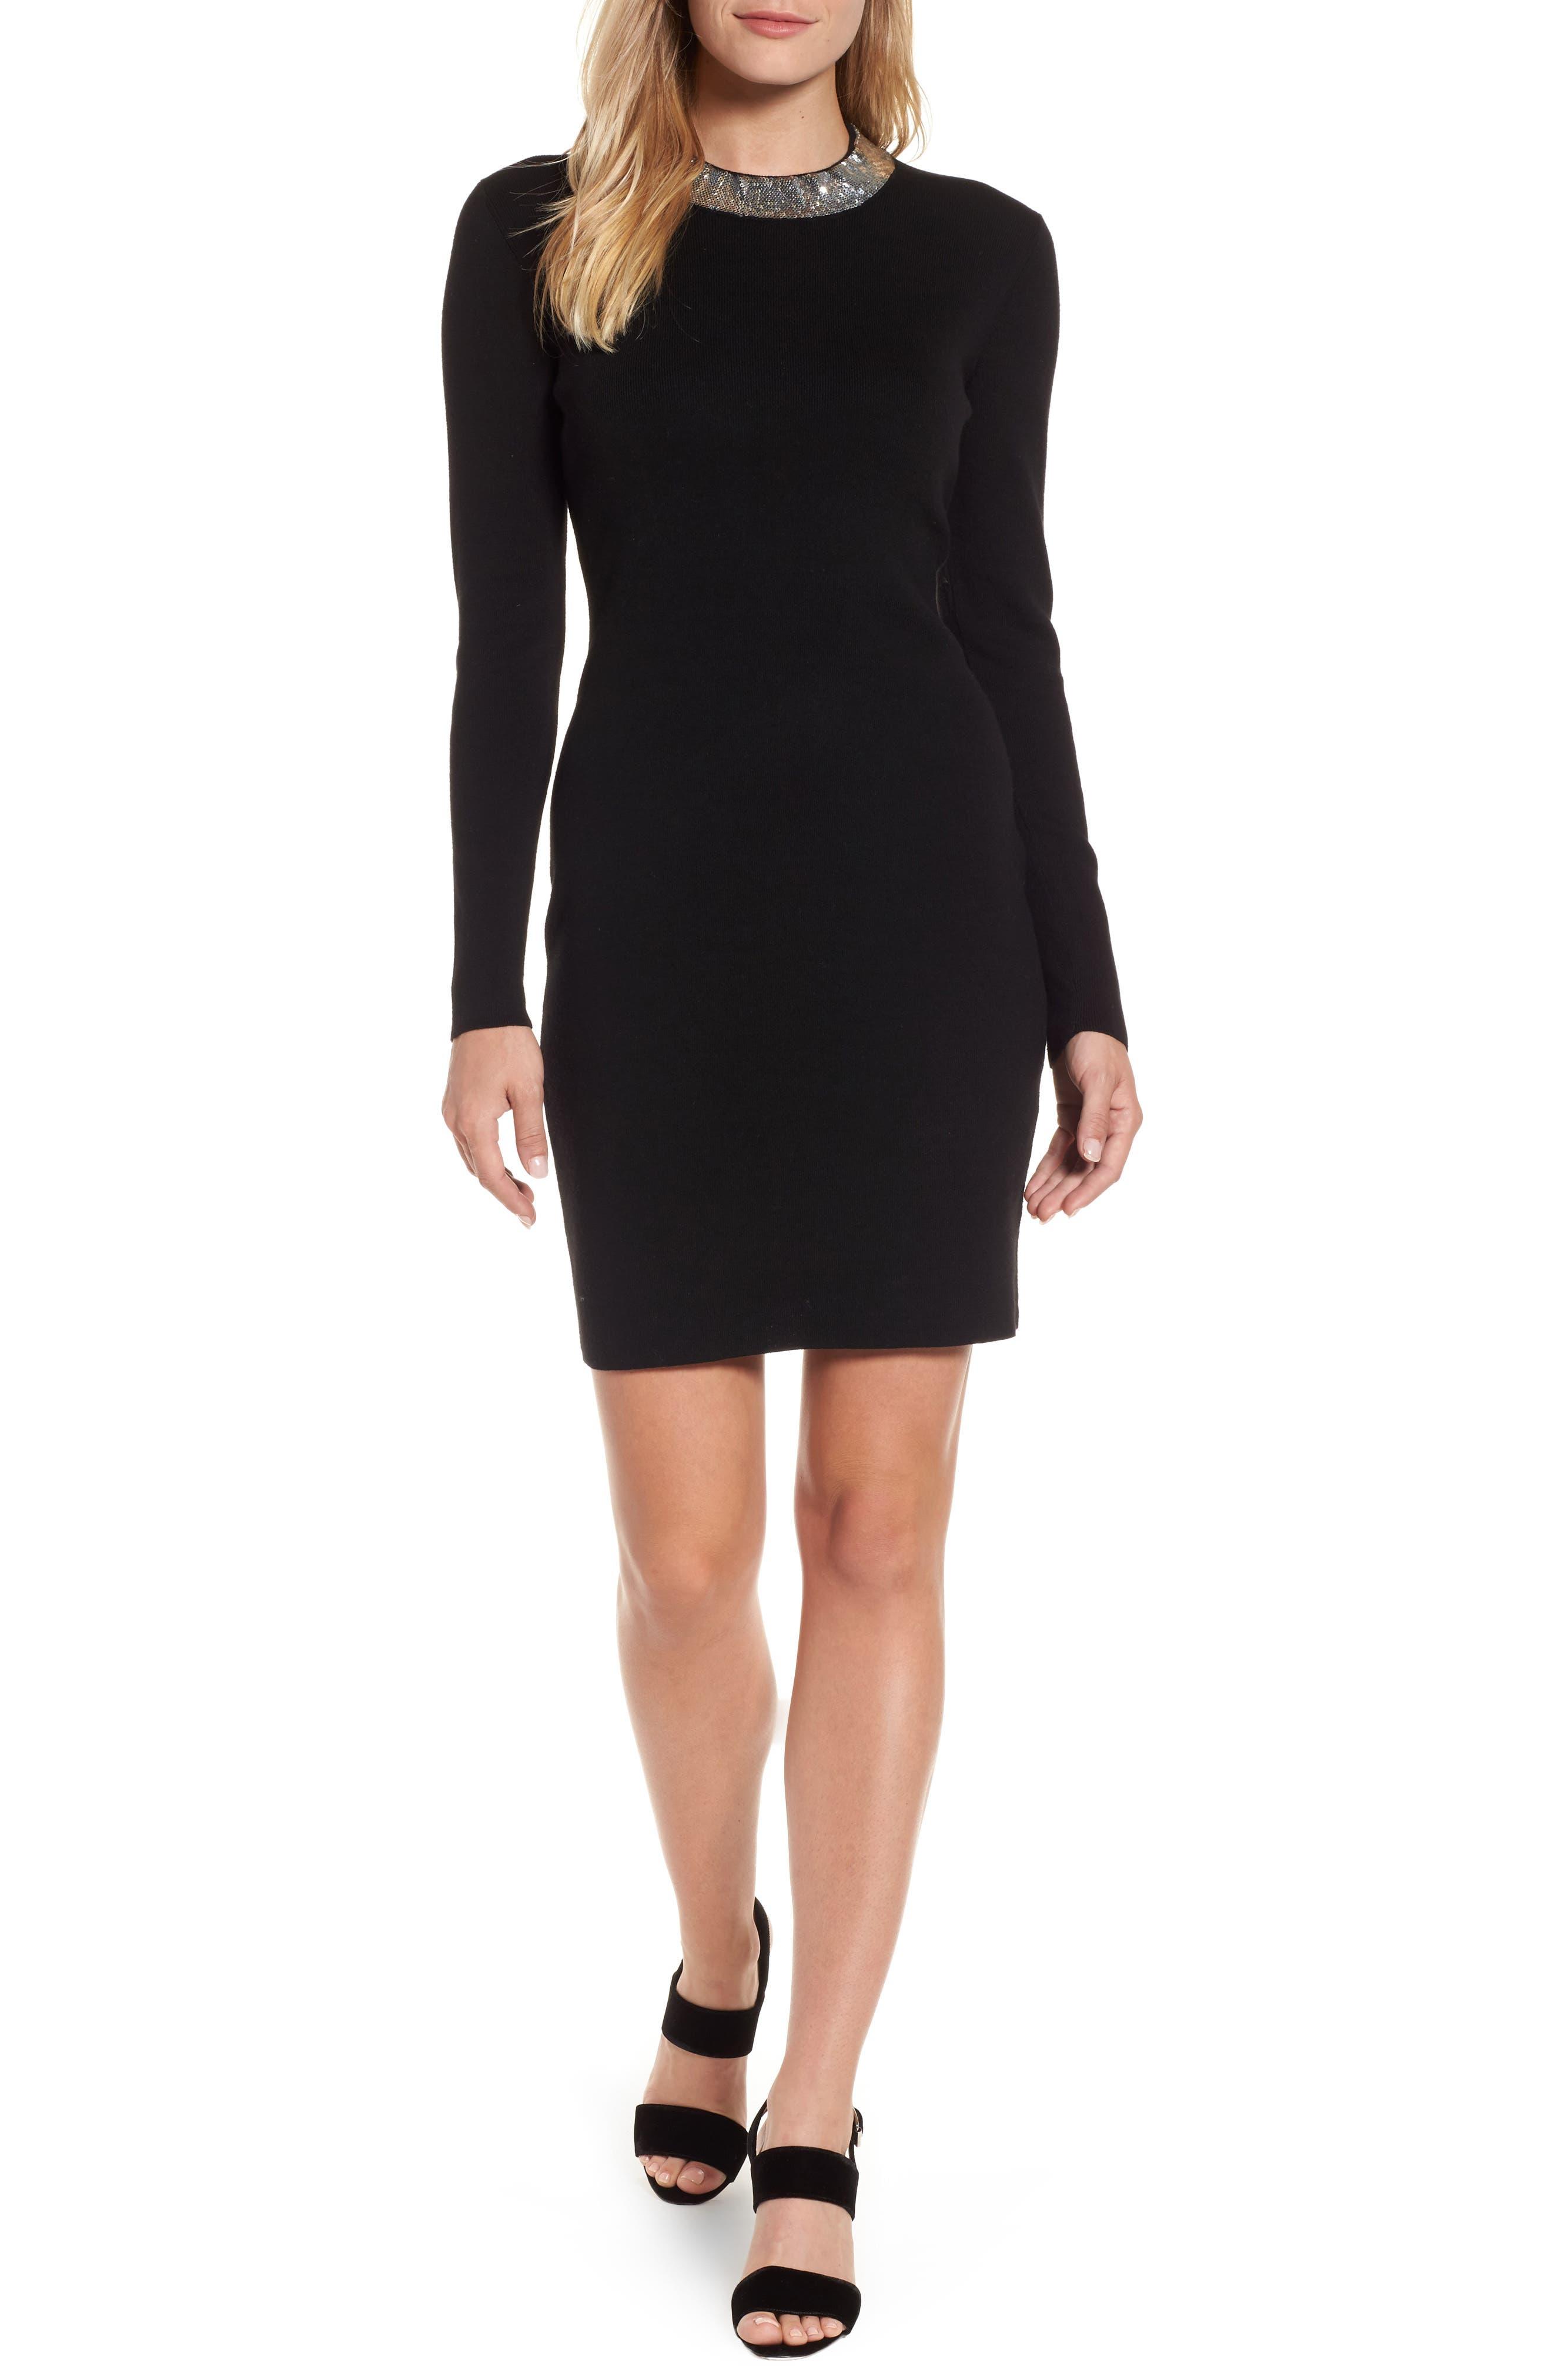 Alternate Image 1 Selected - MICHAEL MIchael Kors Sequin Collar Dress